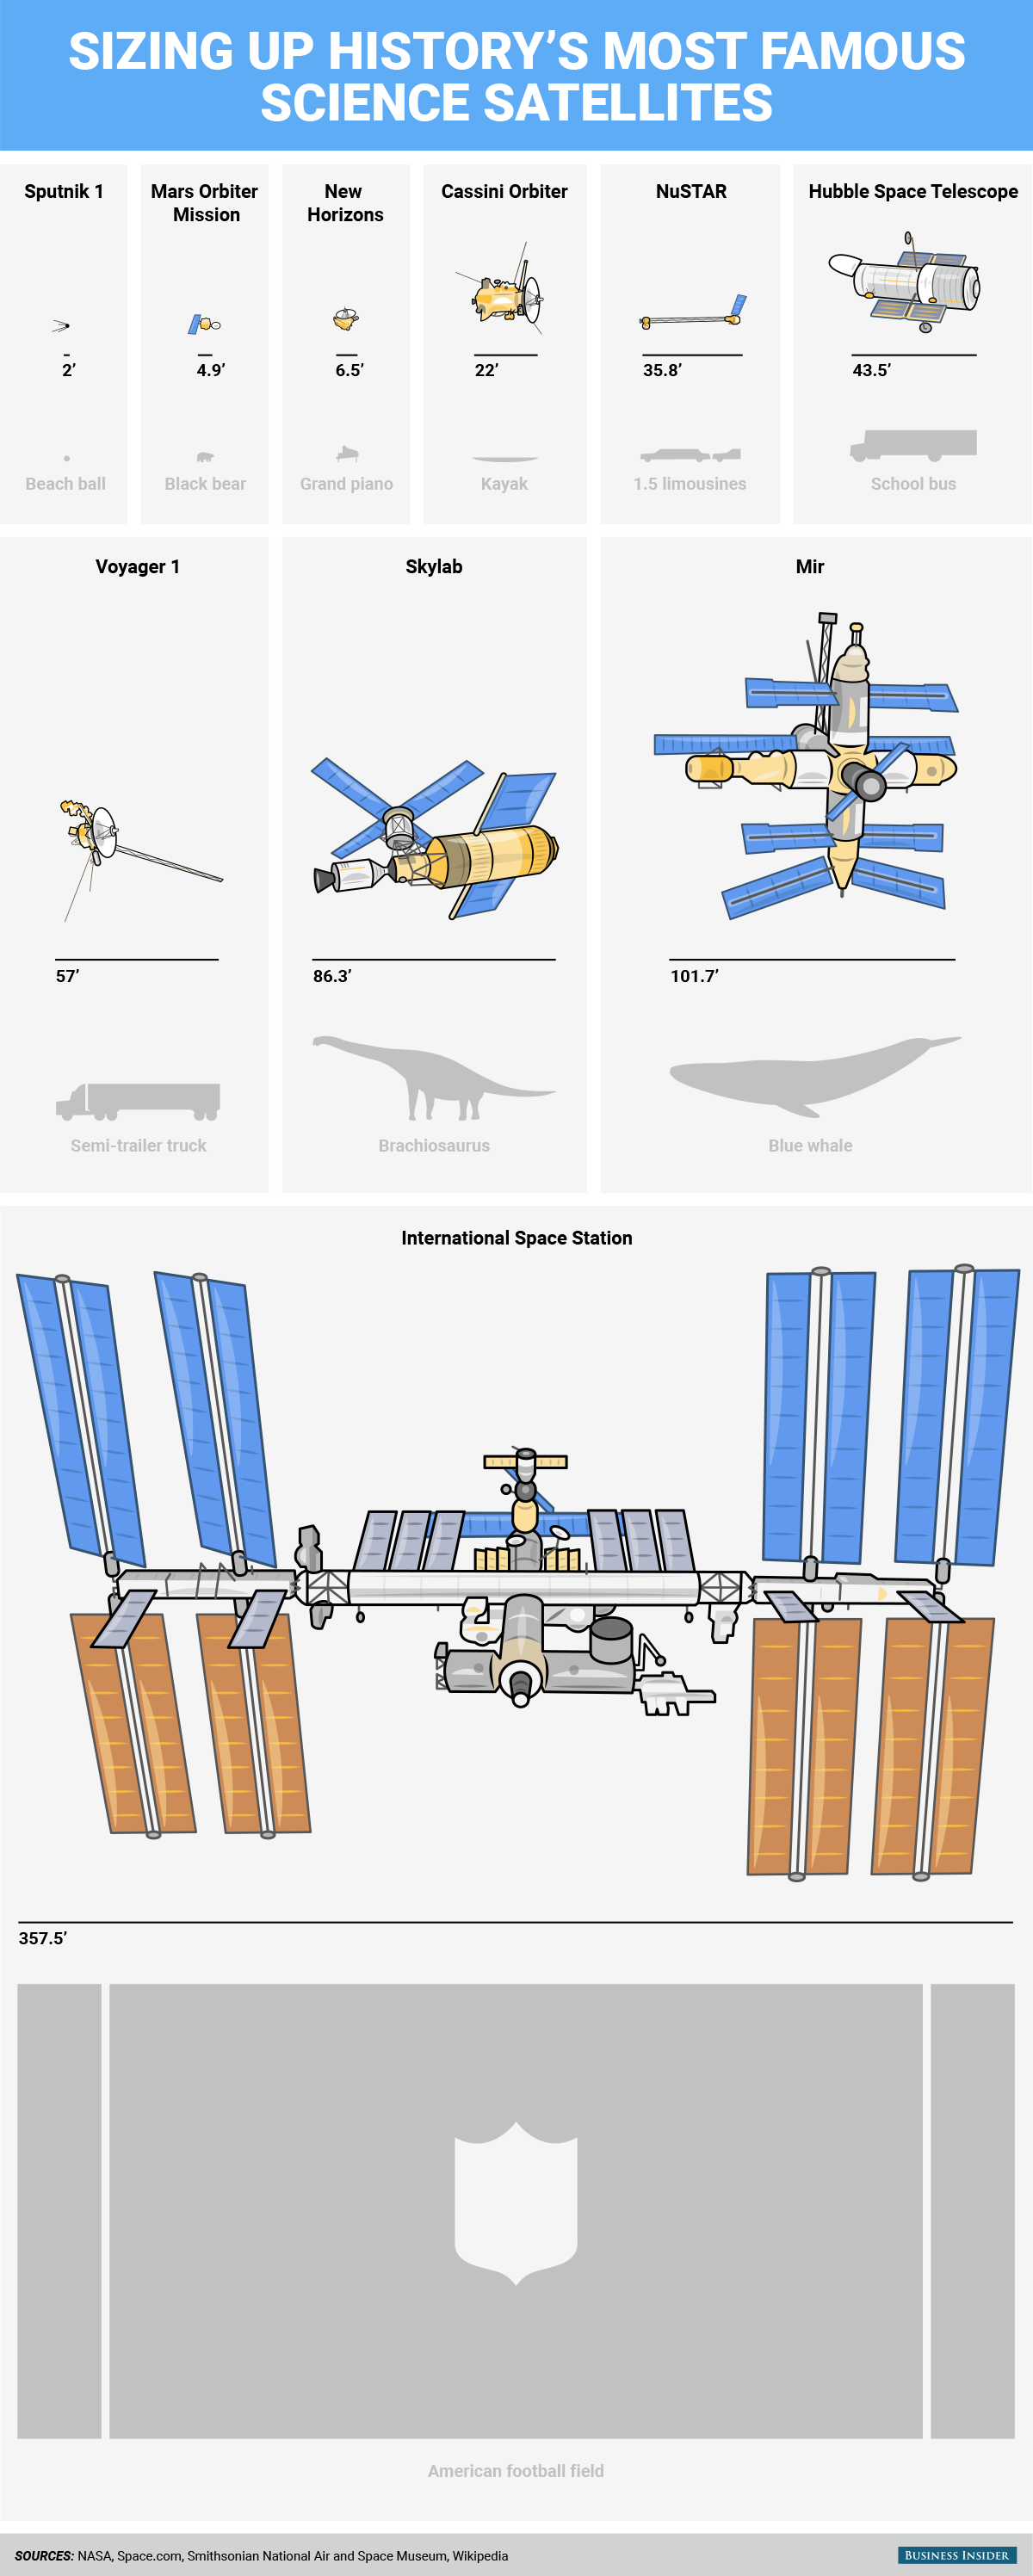 Size of famous satellites.